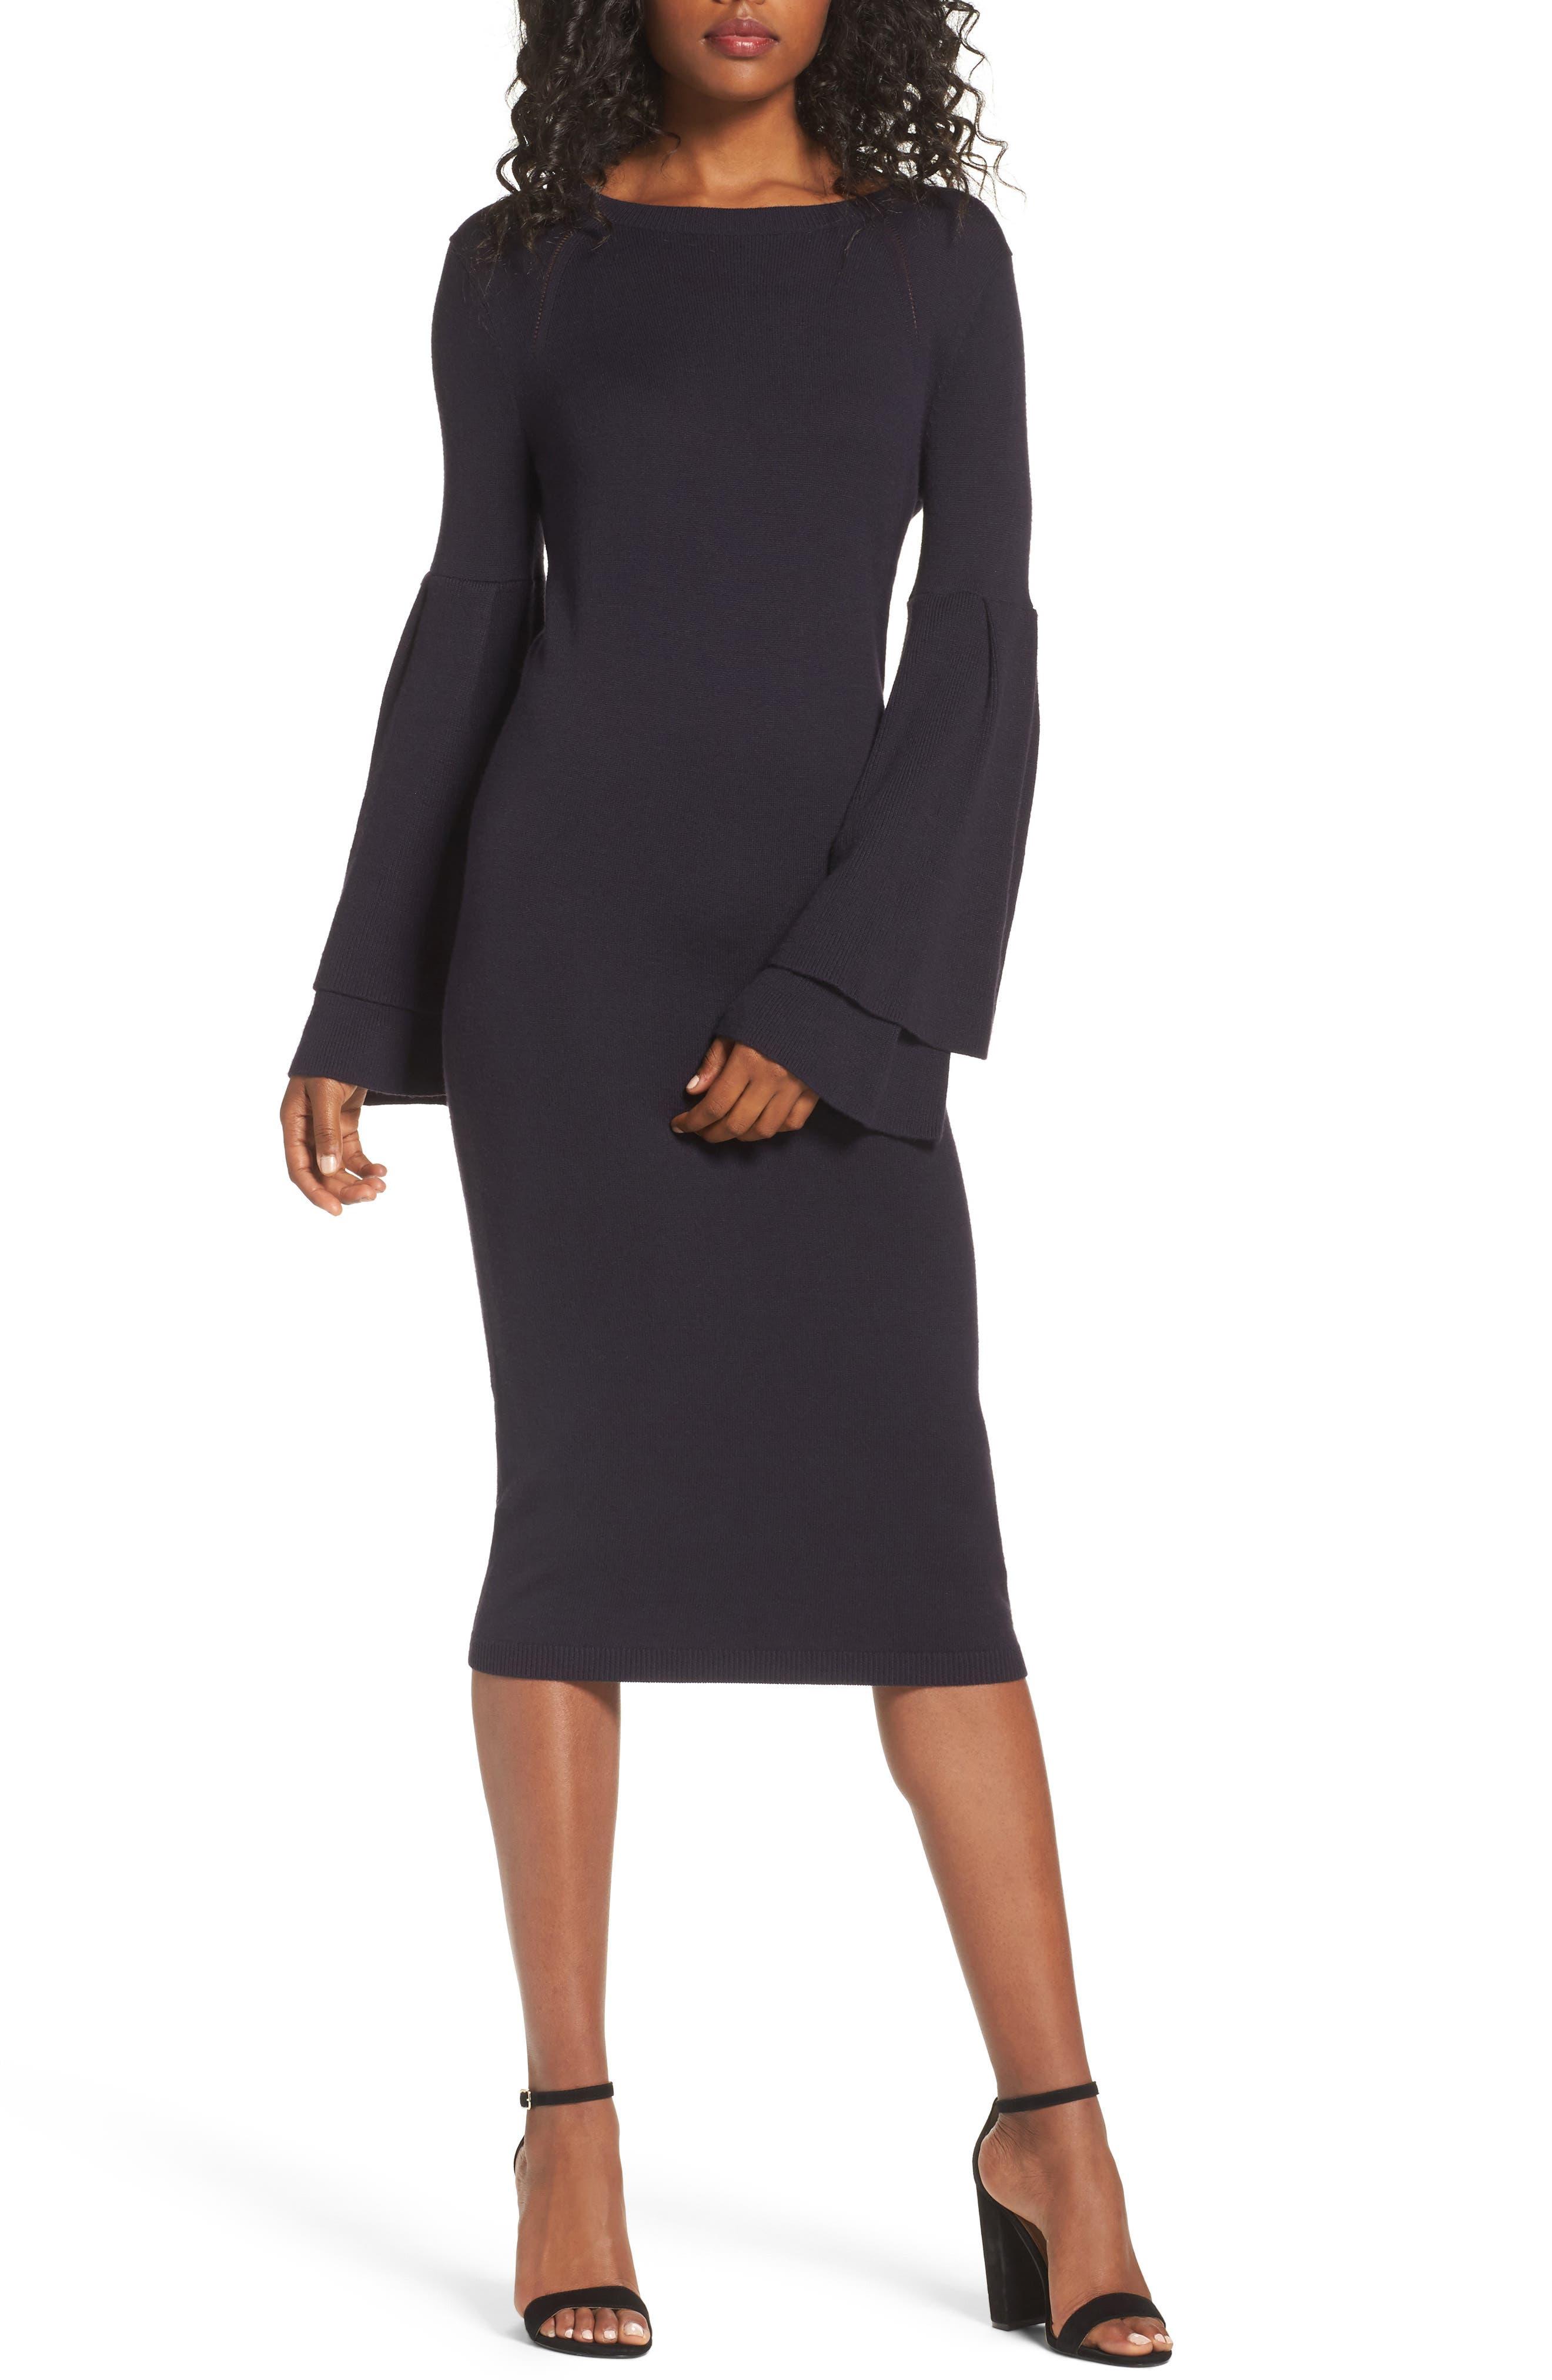 Alternate Image 1 Selected - Chelsea28 Bell Sleeve Sweater Dress